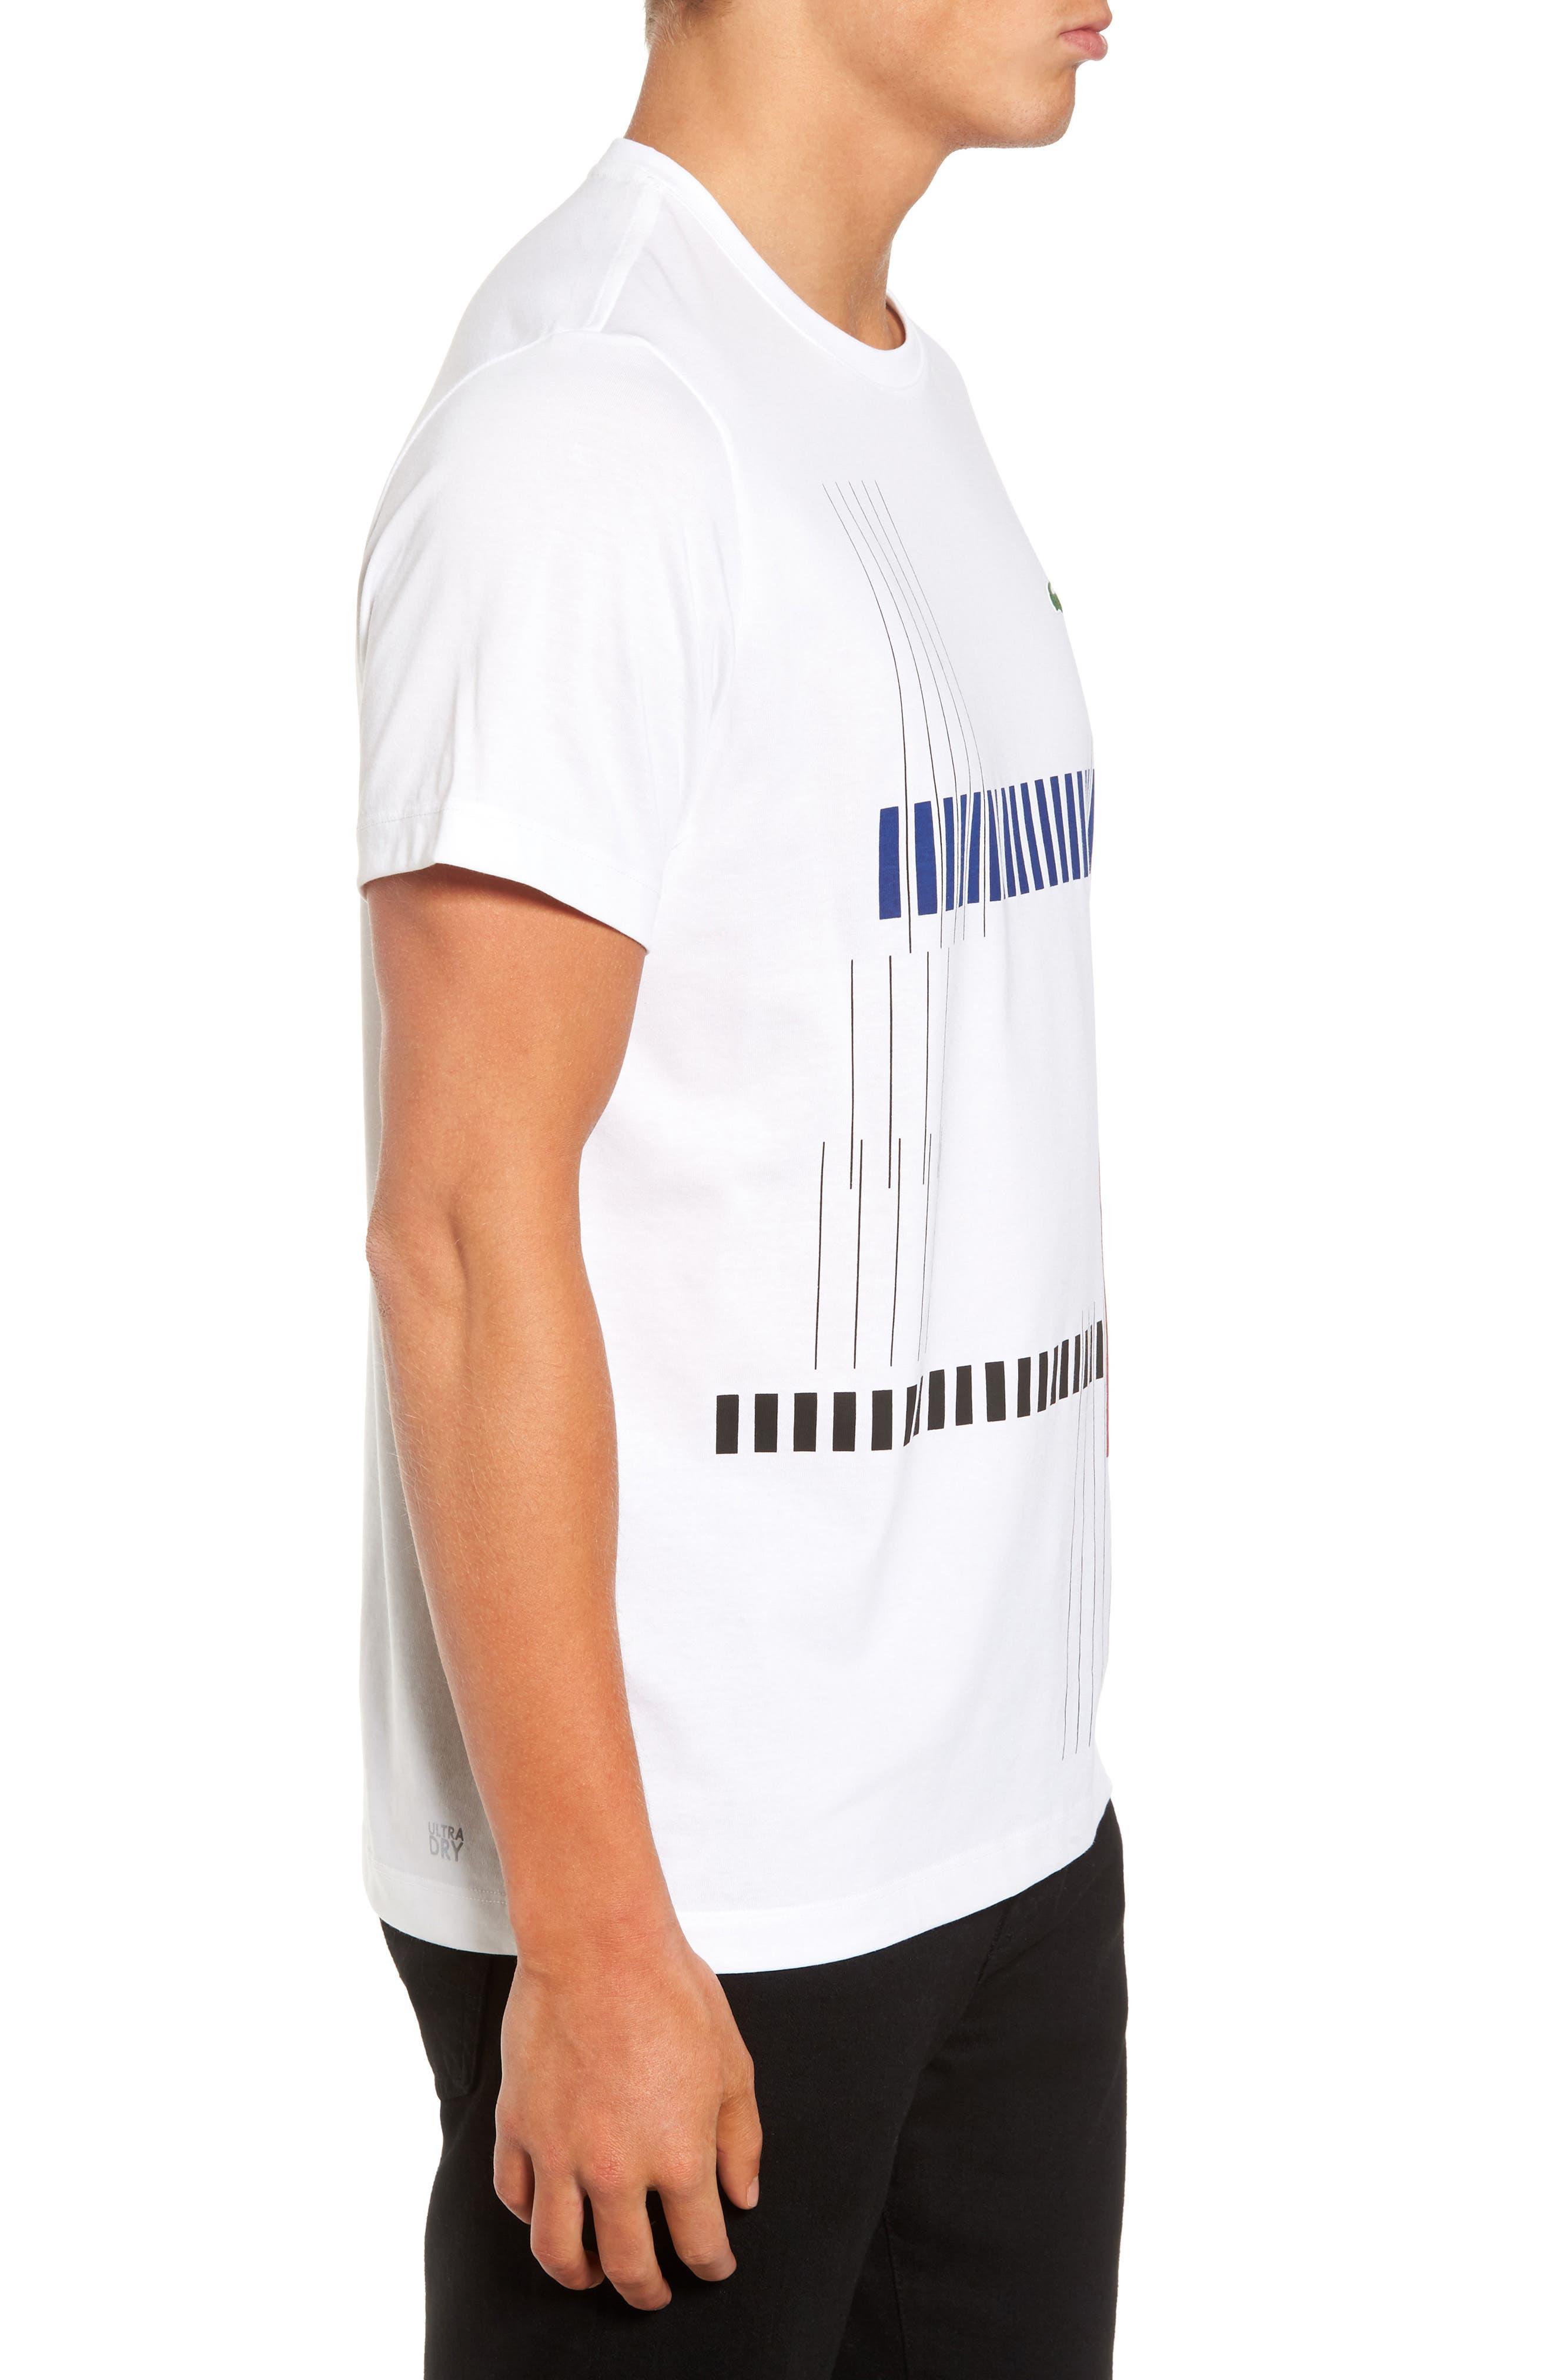 Tech Vertical Stripe Graphic T-Shirt,                             Alternate thumbnail 3, color,                             U88 White/ Ocean-Ladybird-Blac